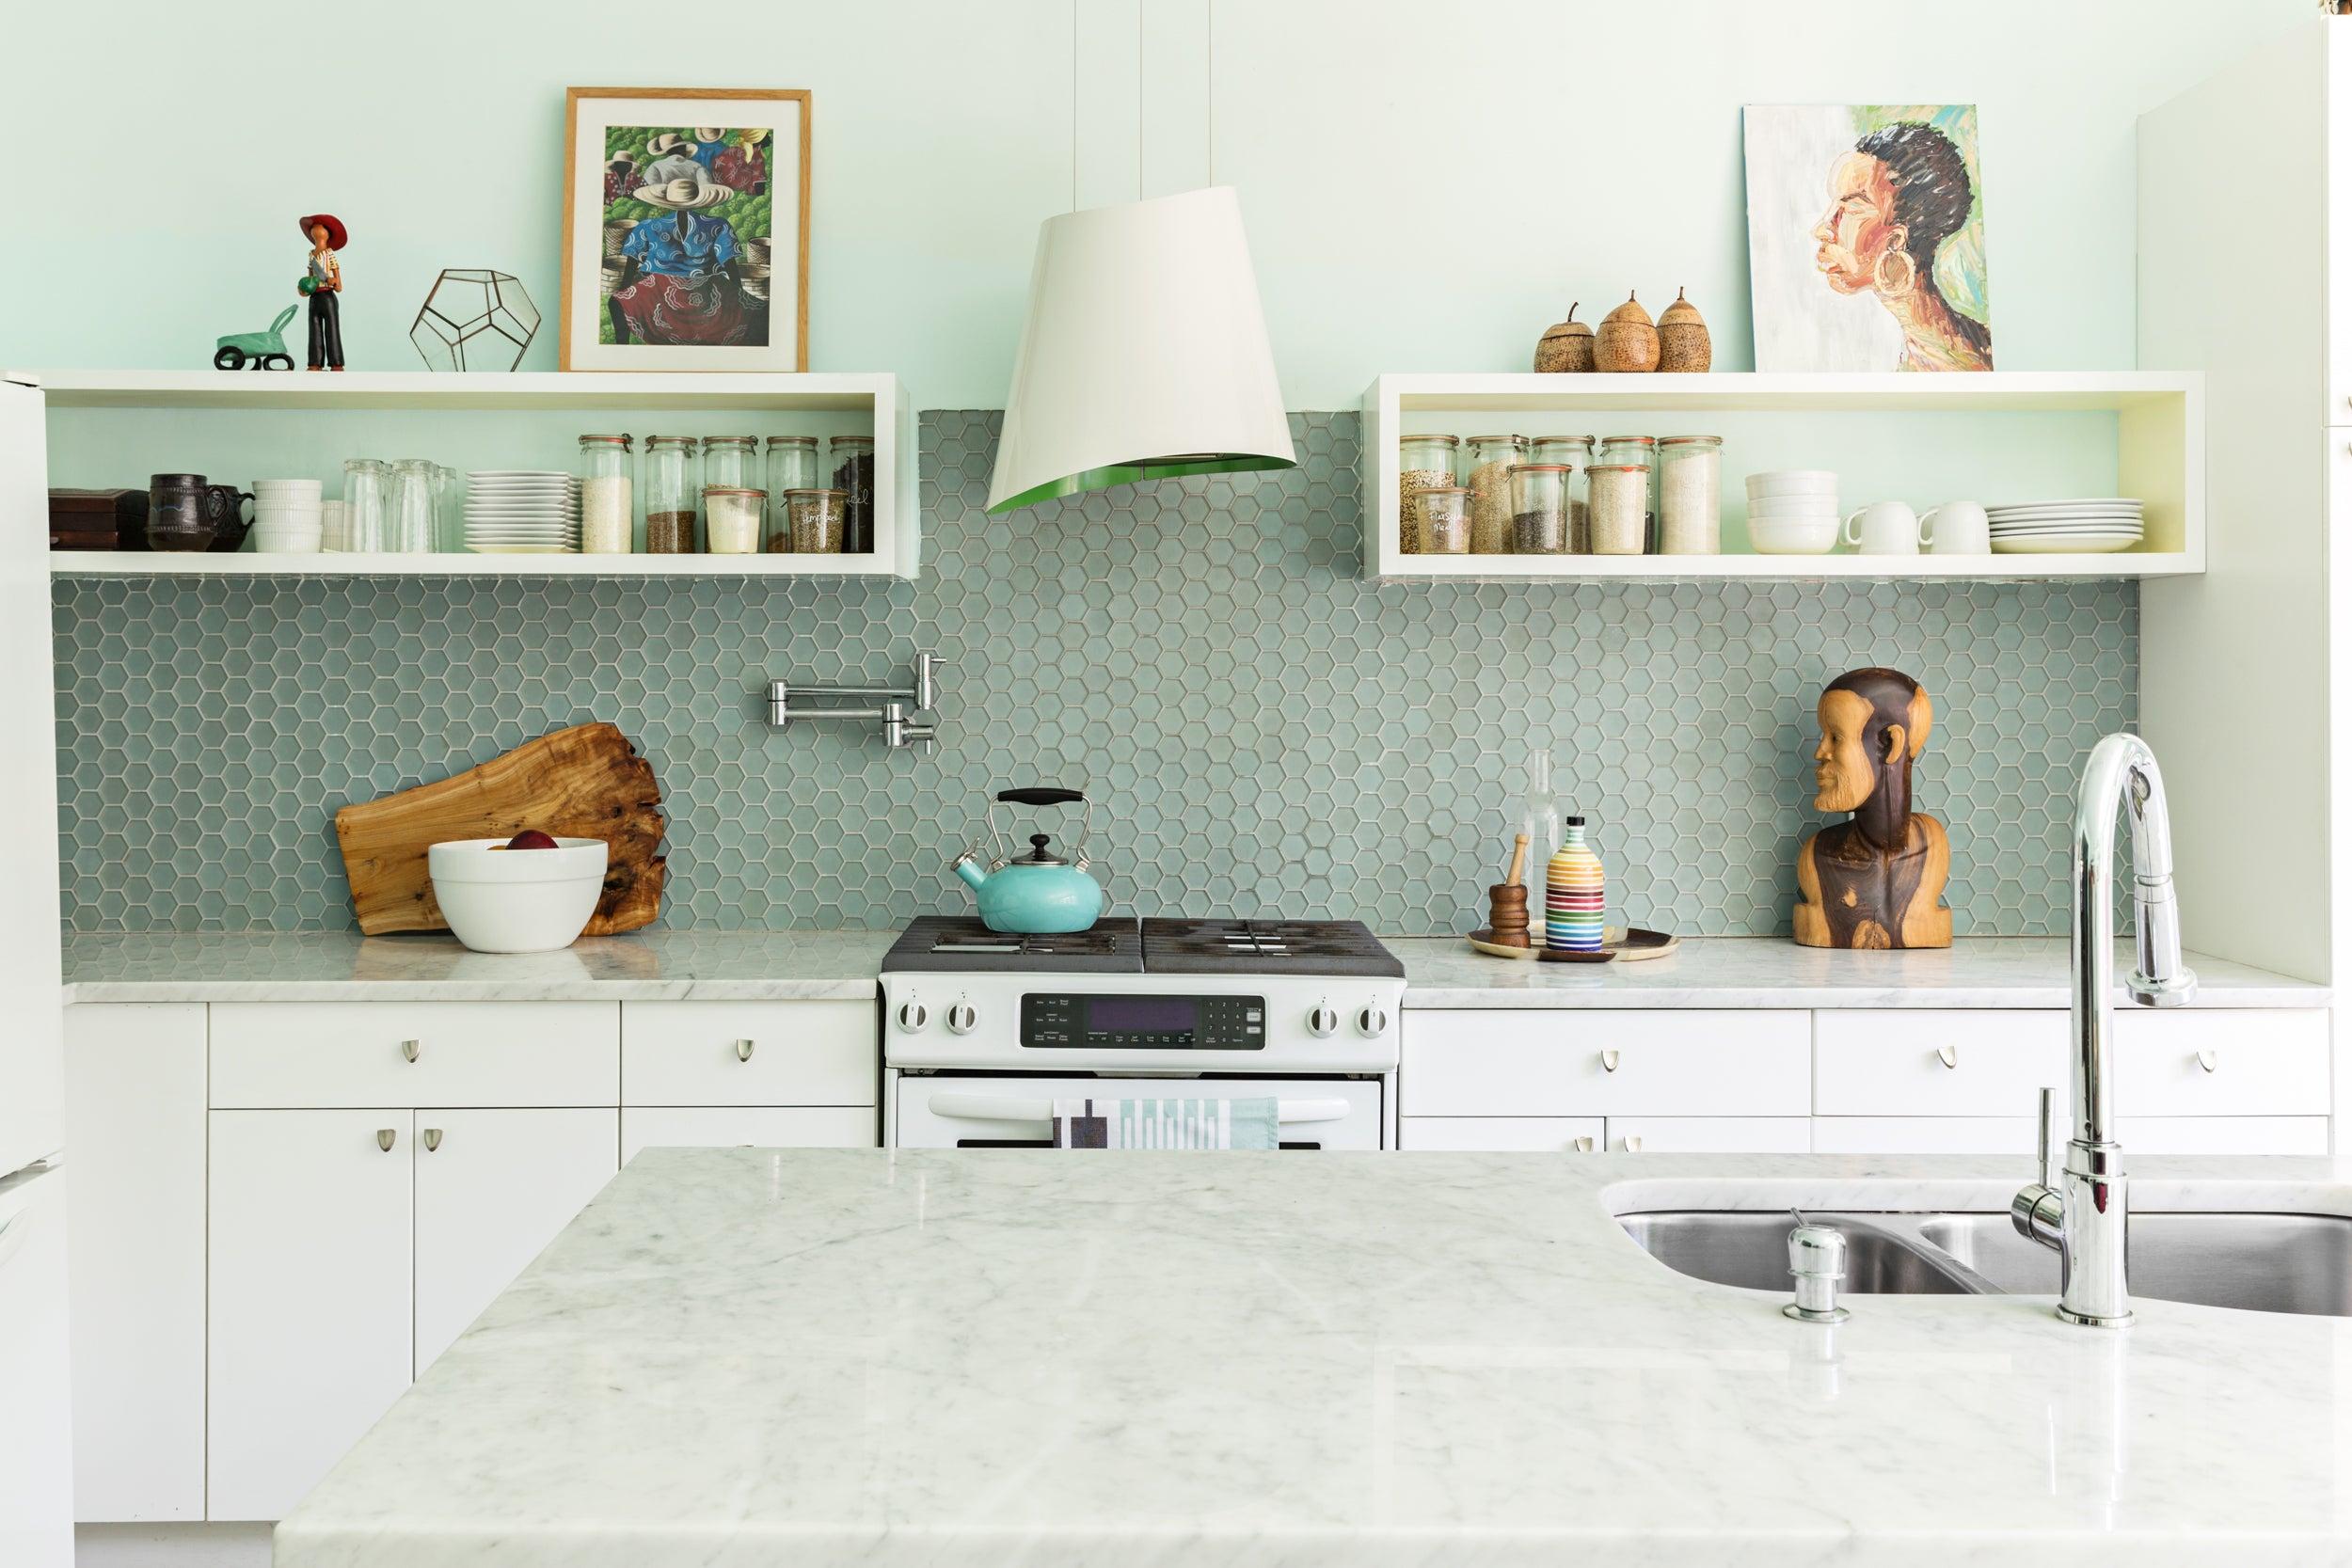 malene b brooklyn kitchen